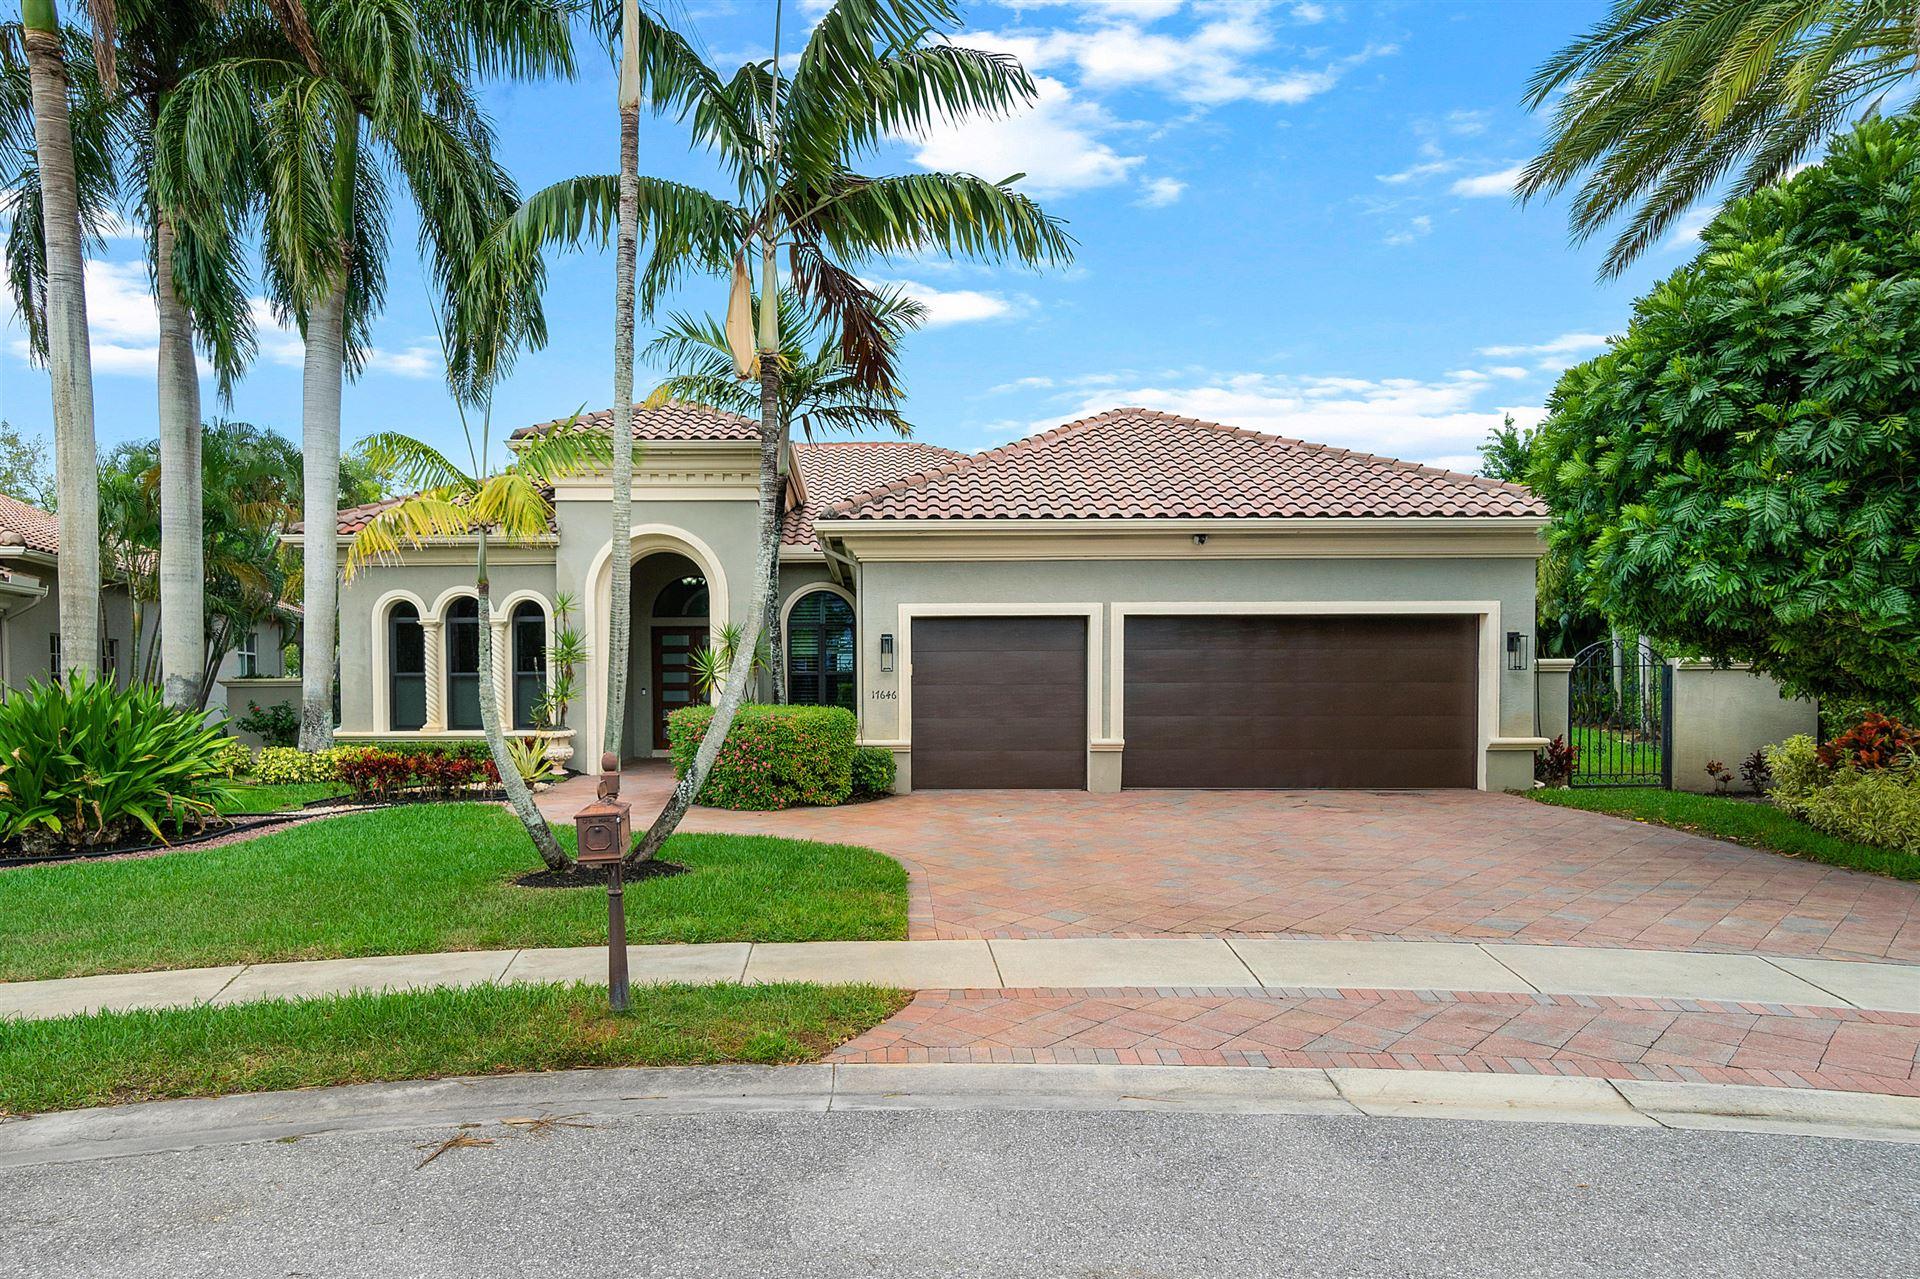 17646 Circle Pond Court, Boca Raton, FL 33496 - MLS#: RX-10697261